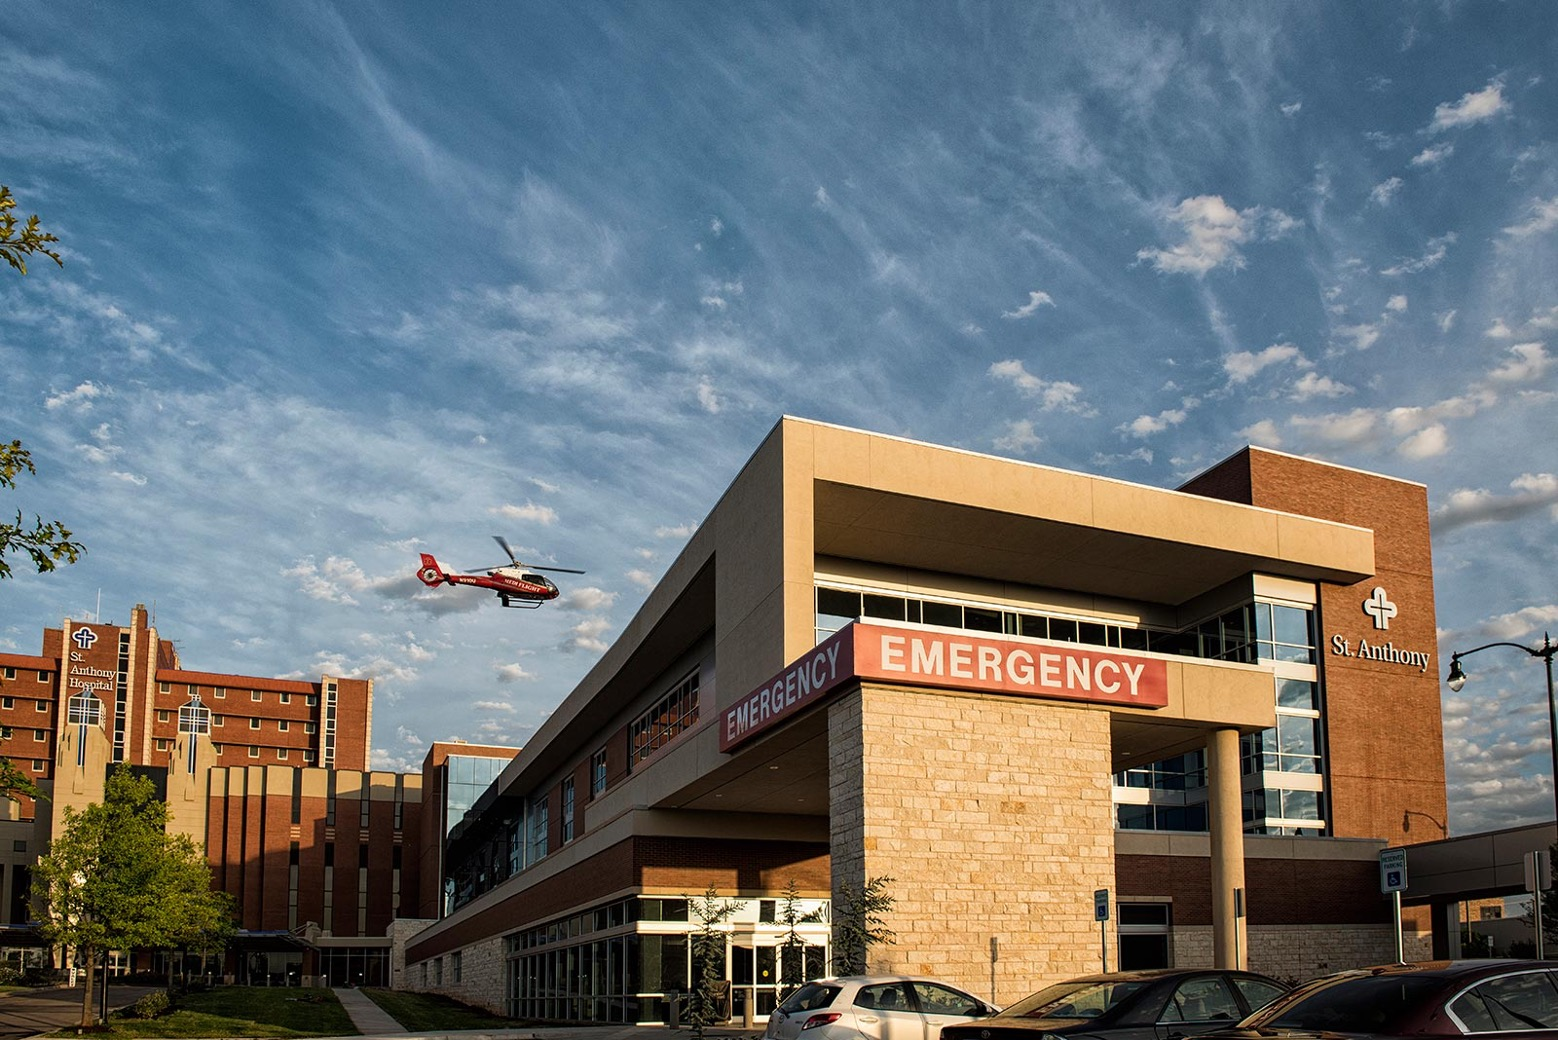 St. Anthony Pavilion helicopter flying into helipad